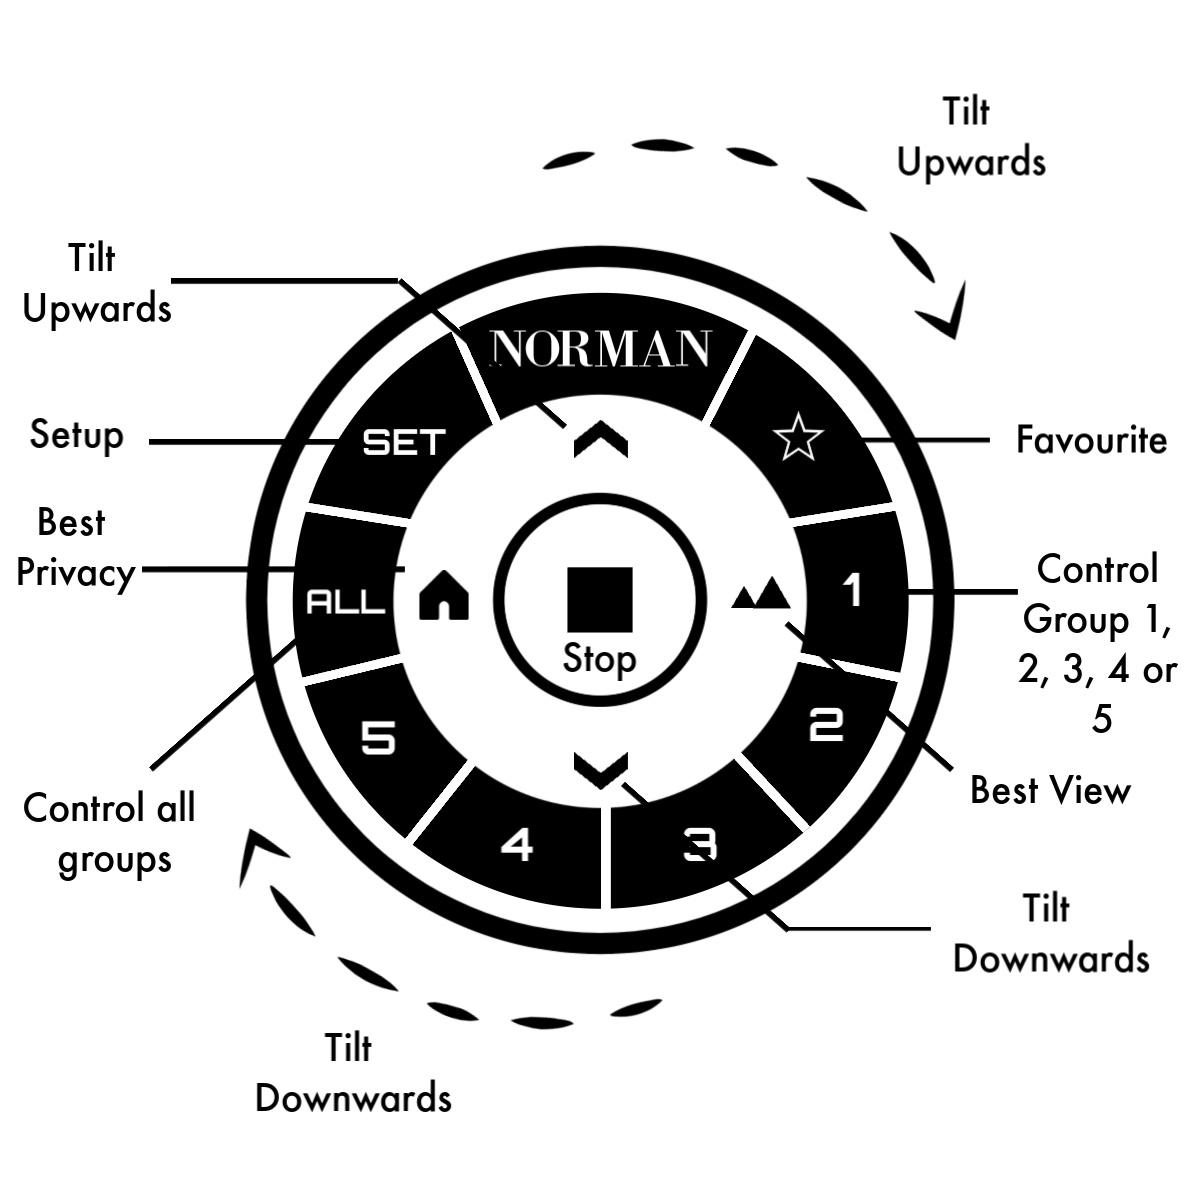 powermotion dial remote blueprint diagram listing all control options